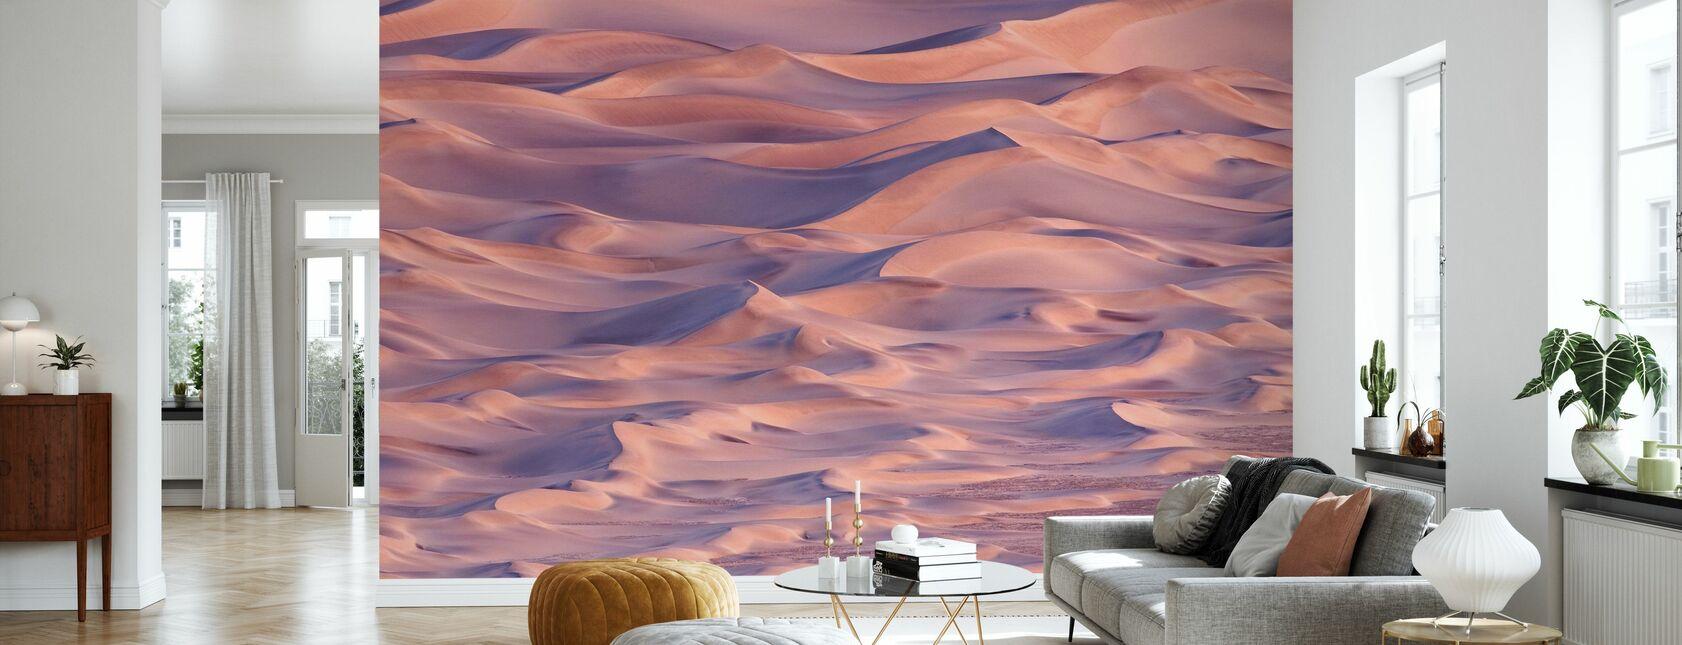 Zandduinen bij zonsondergang, Californië - Behang - Woonkamer